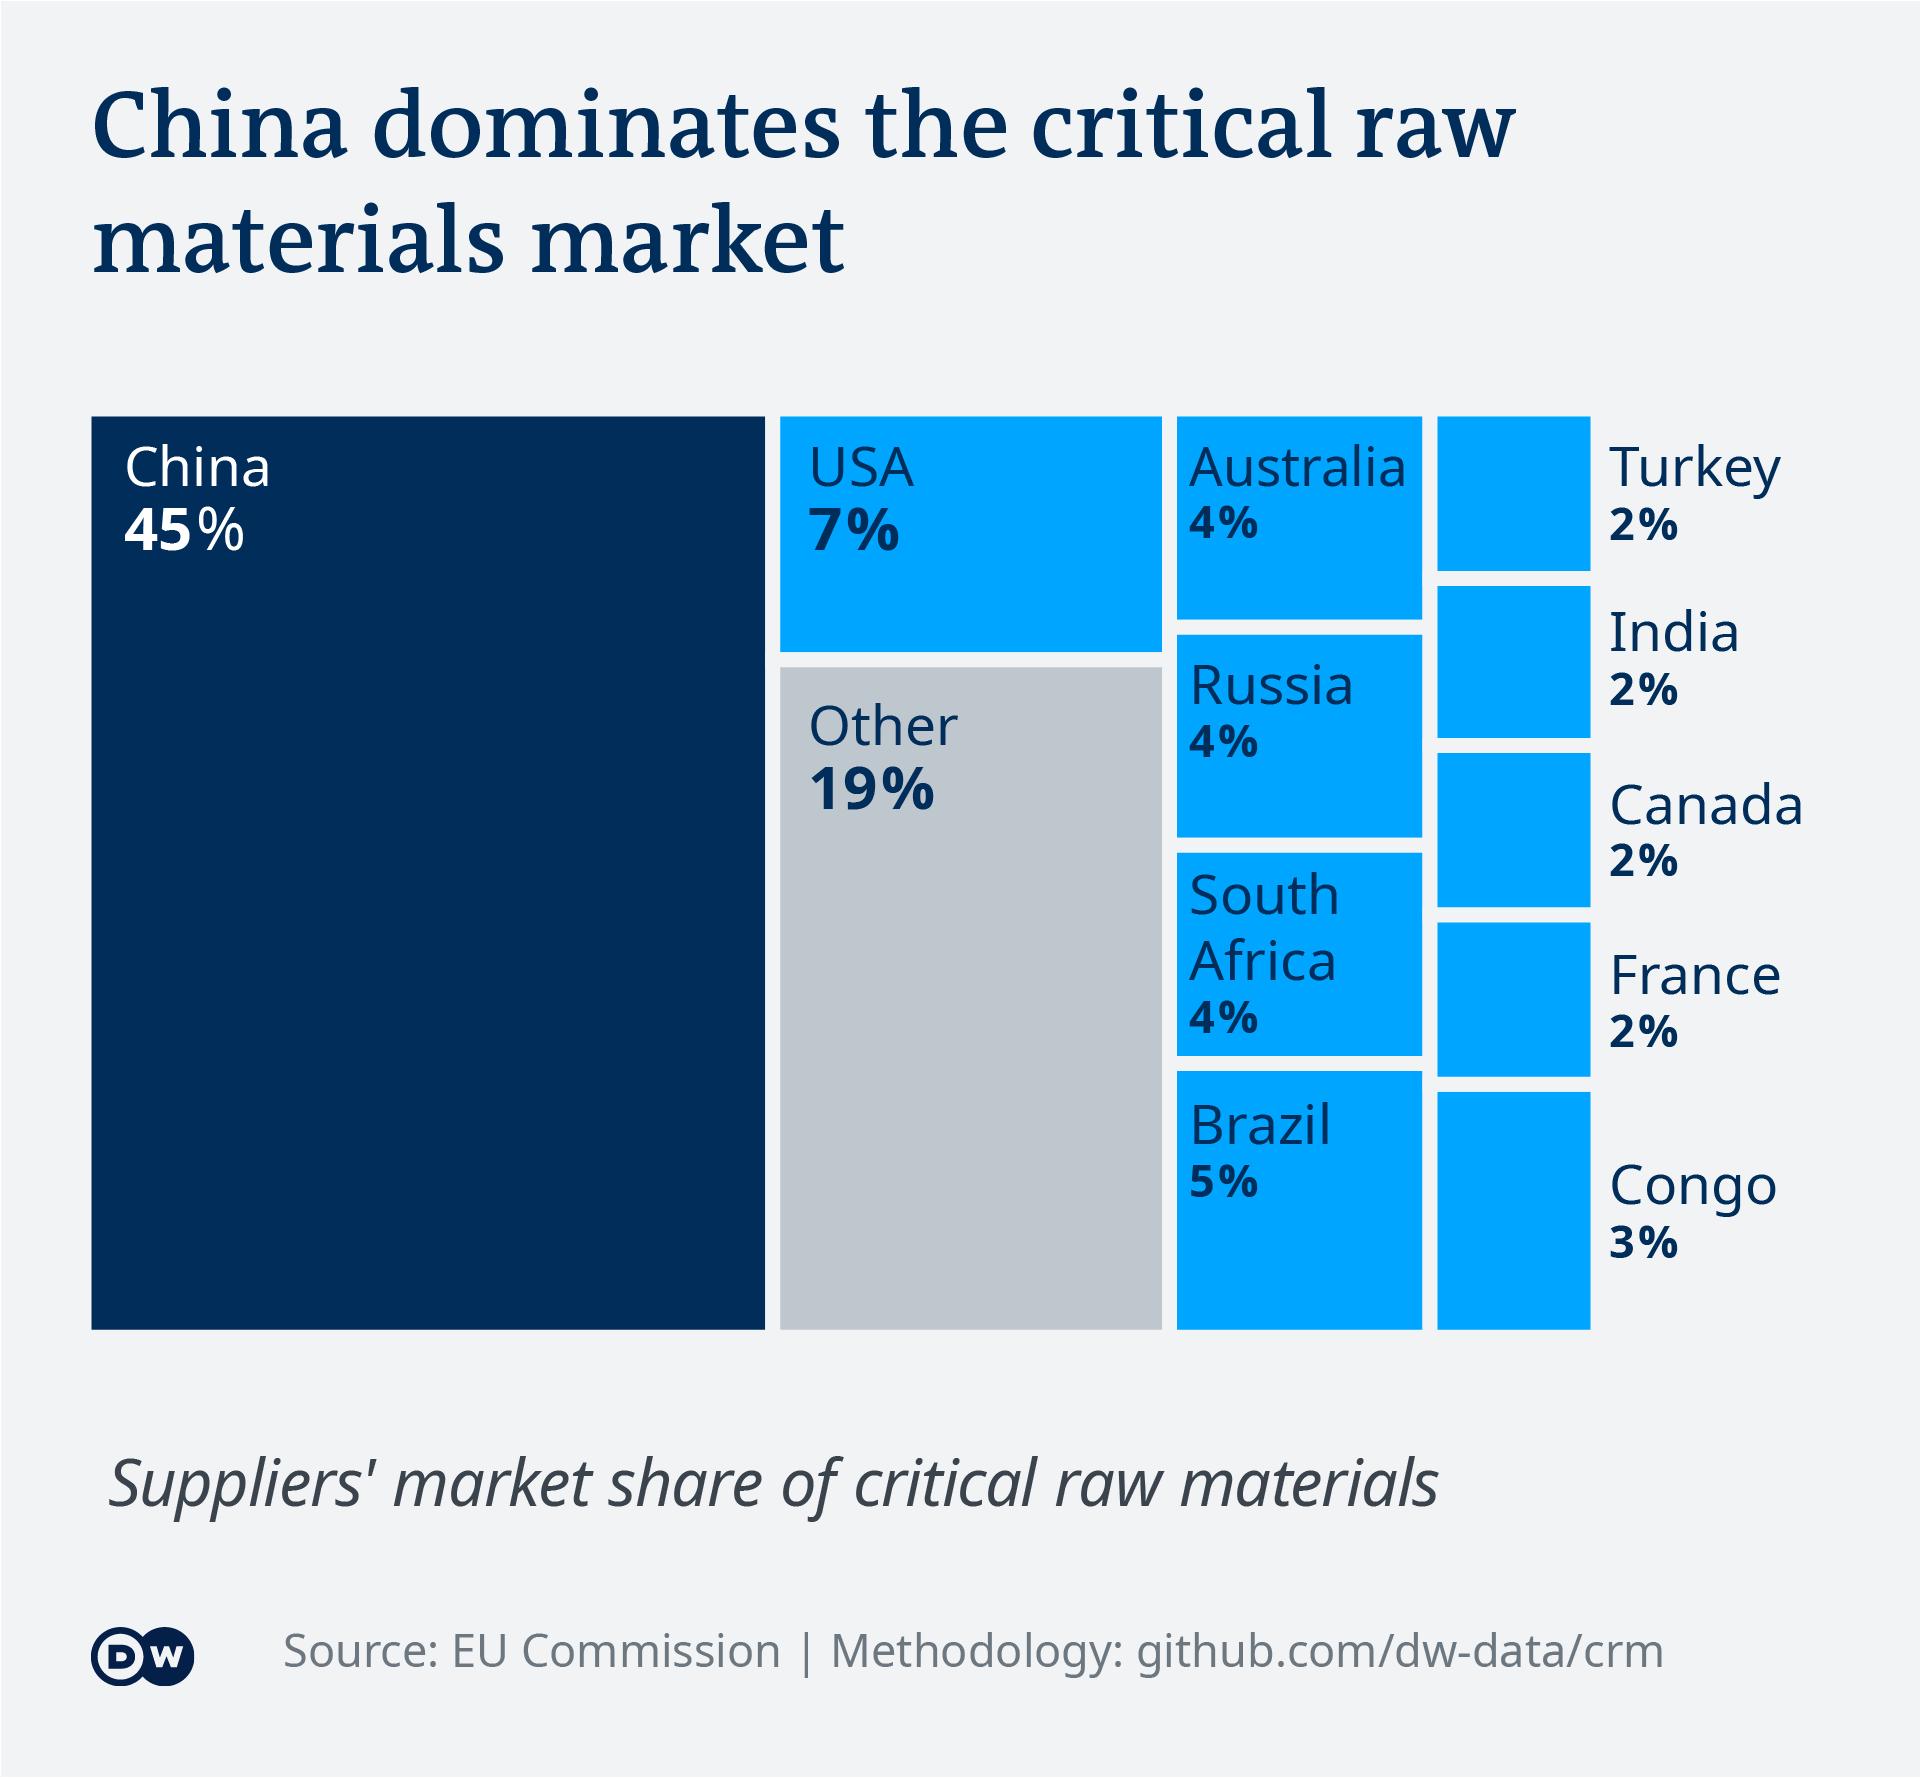 Data visualization: China dominates the critical raw materials market